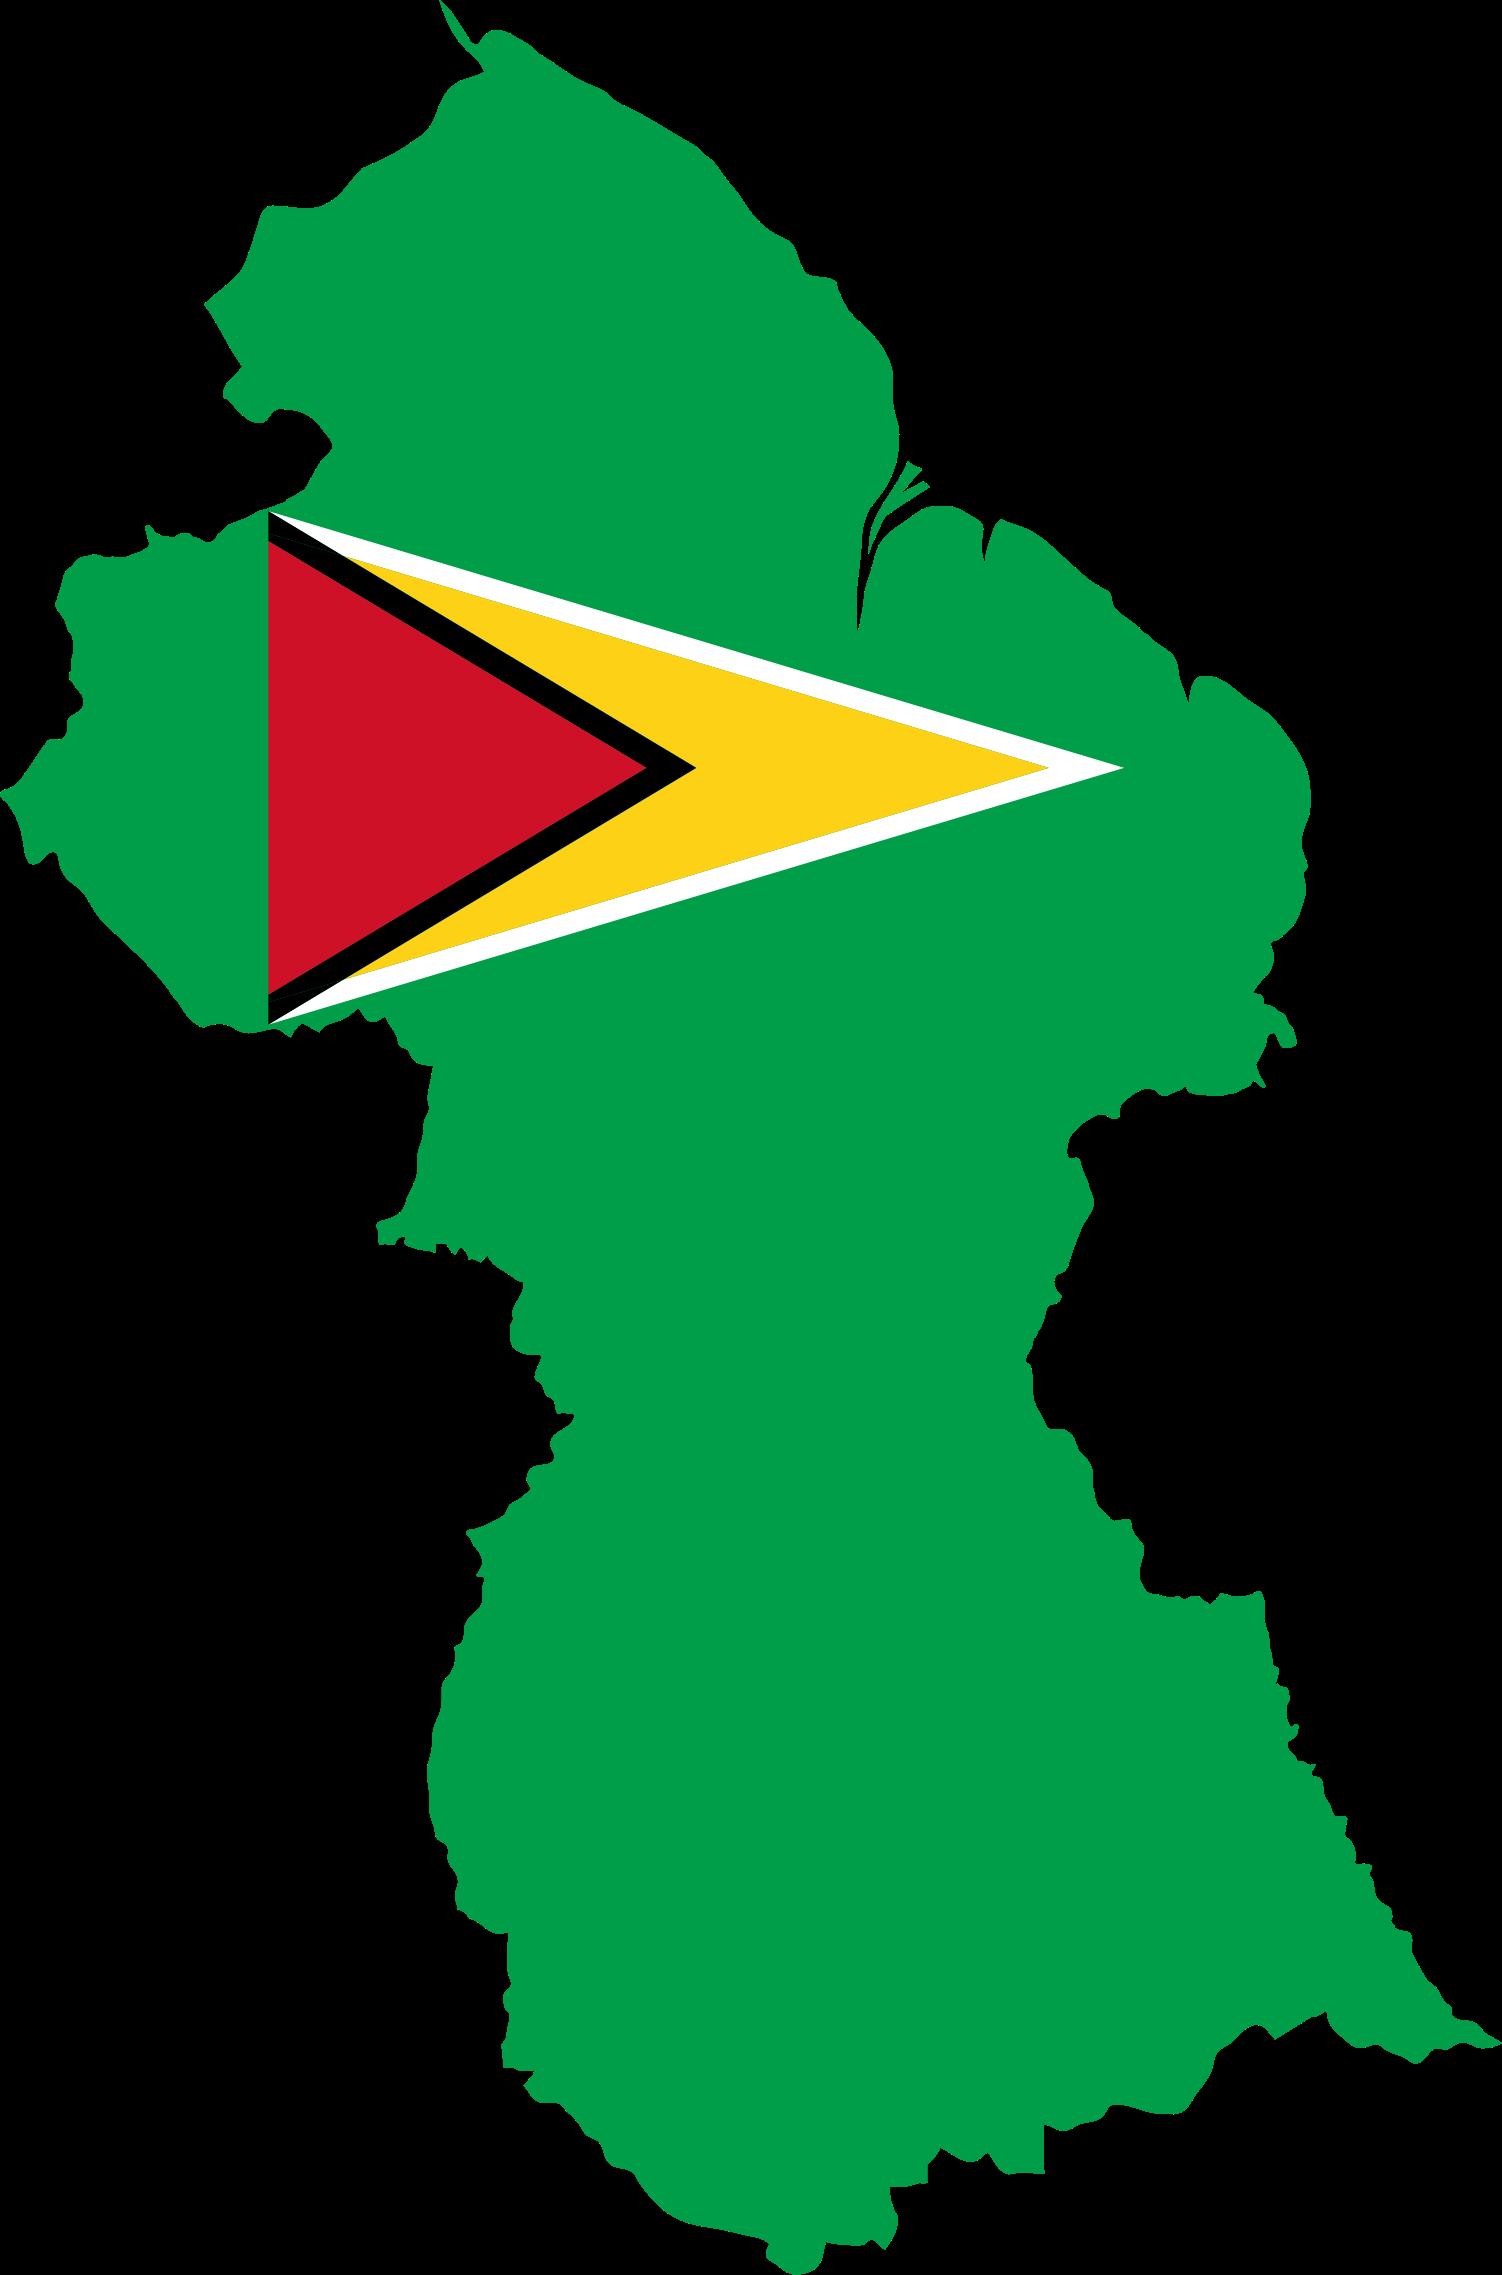 Clipart map clip art. Guyana flag big image